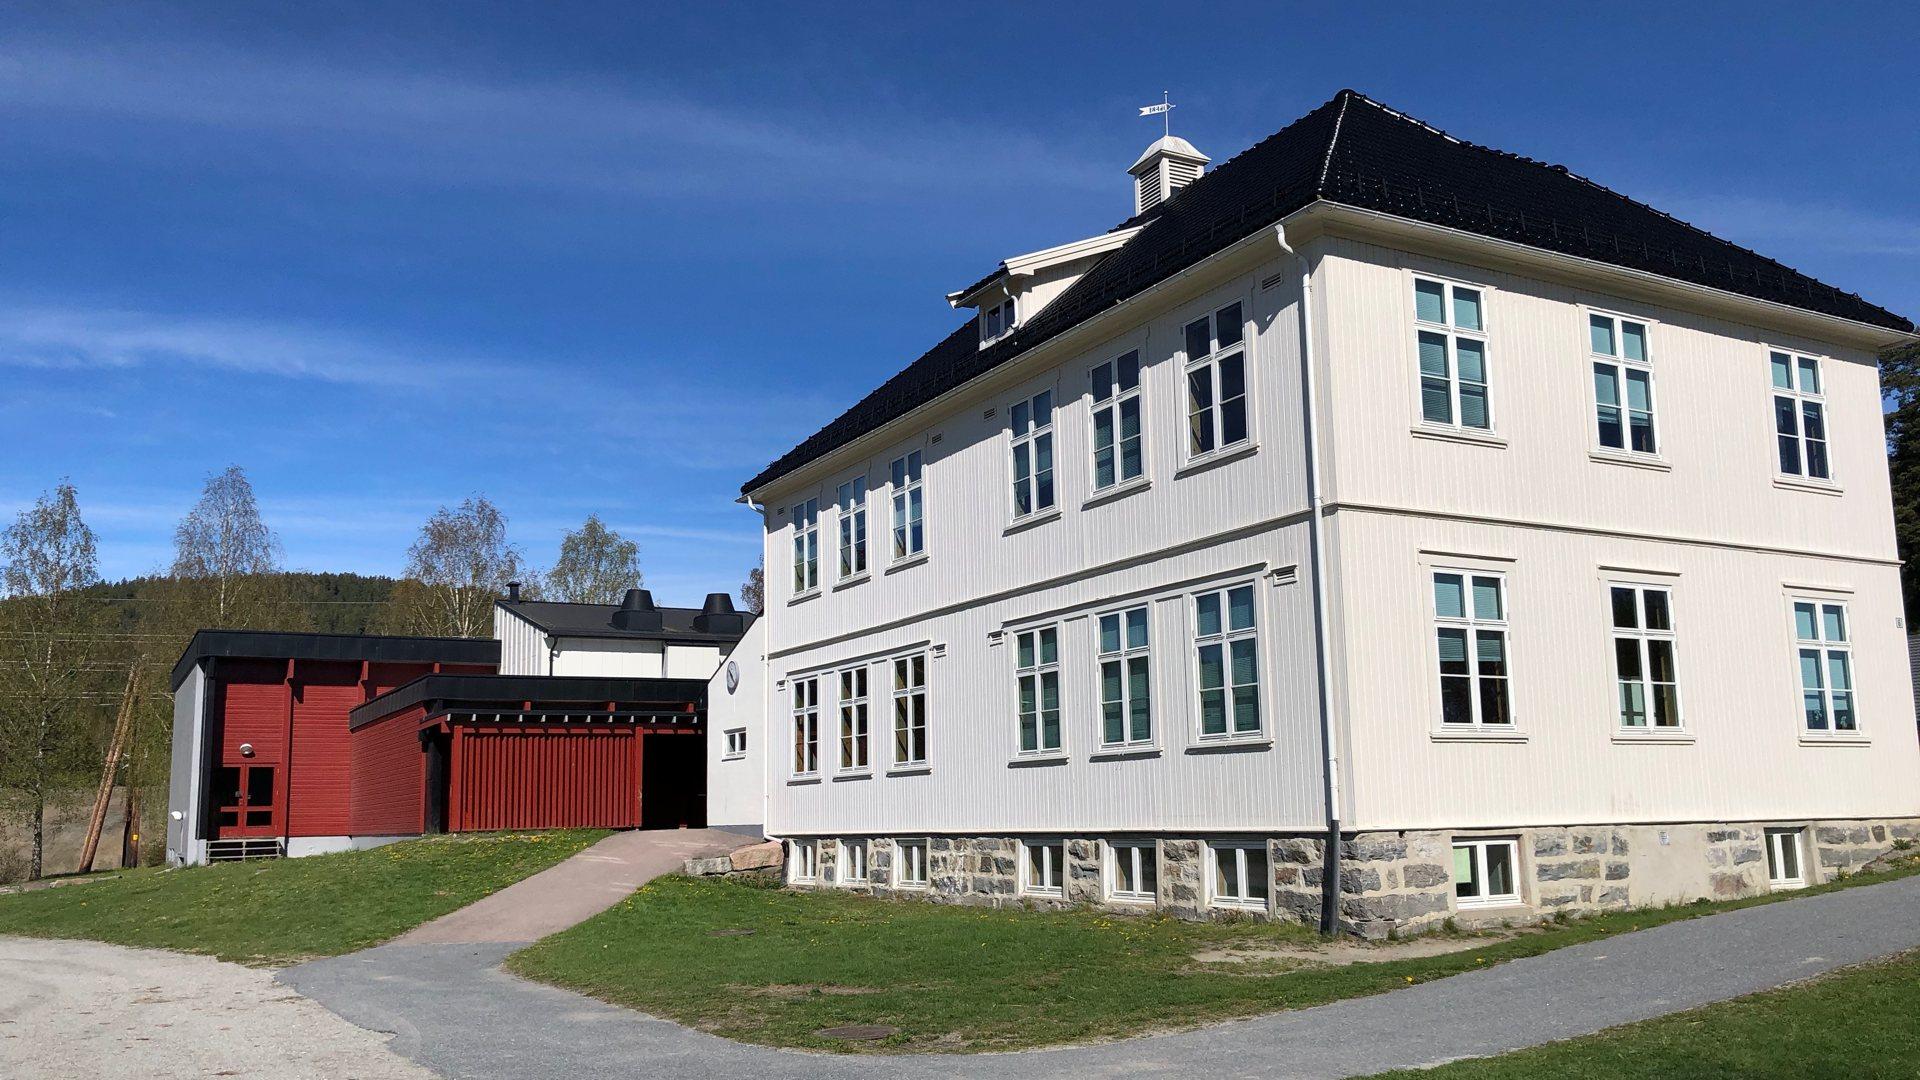 2020-05-05_KommunenBrannAvvik